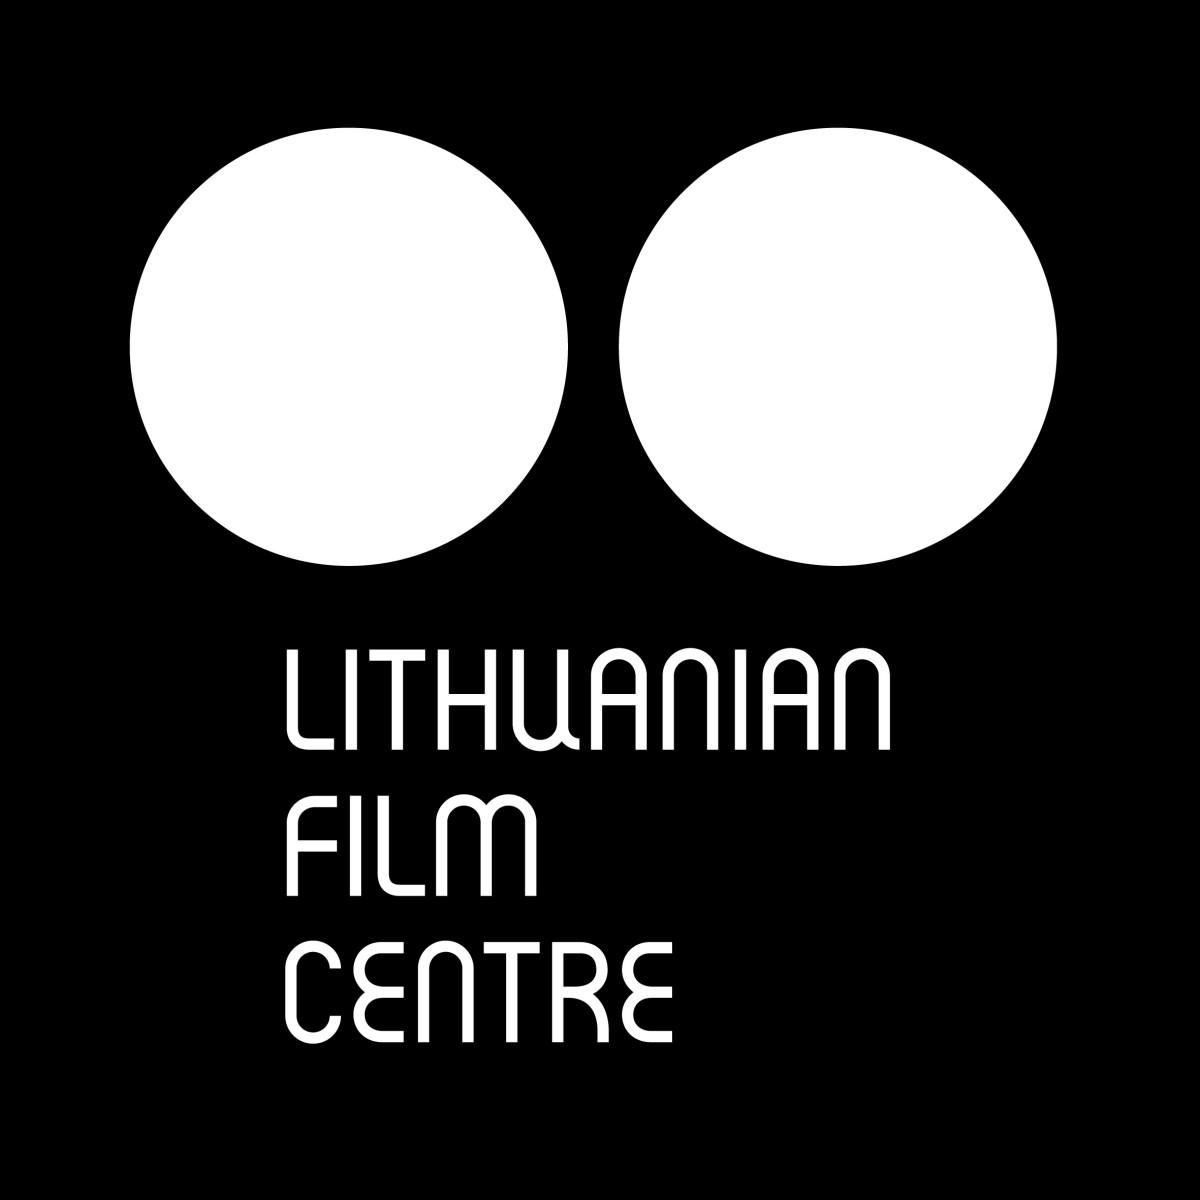 Lithuanian Film Center